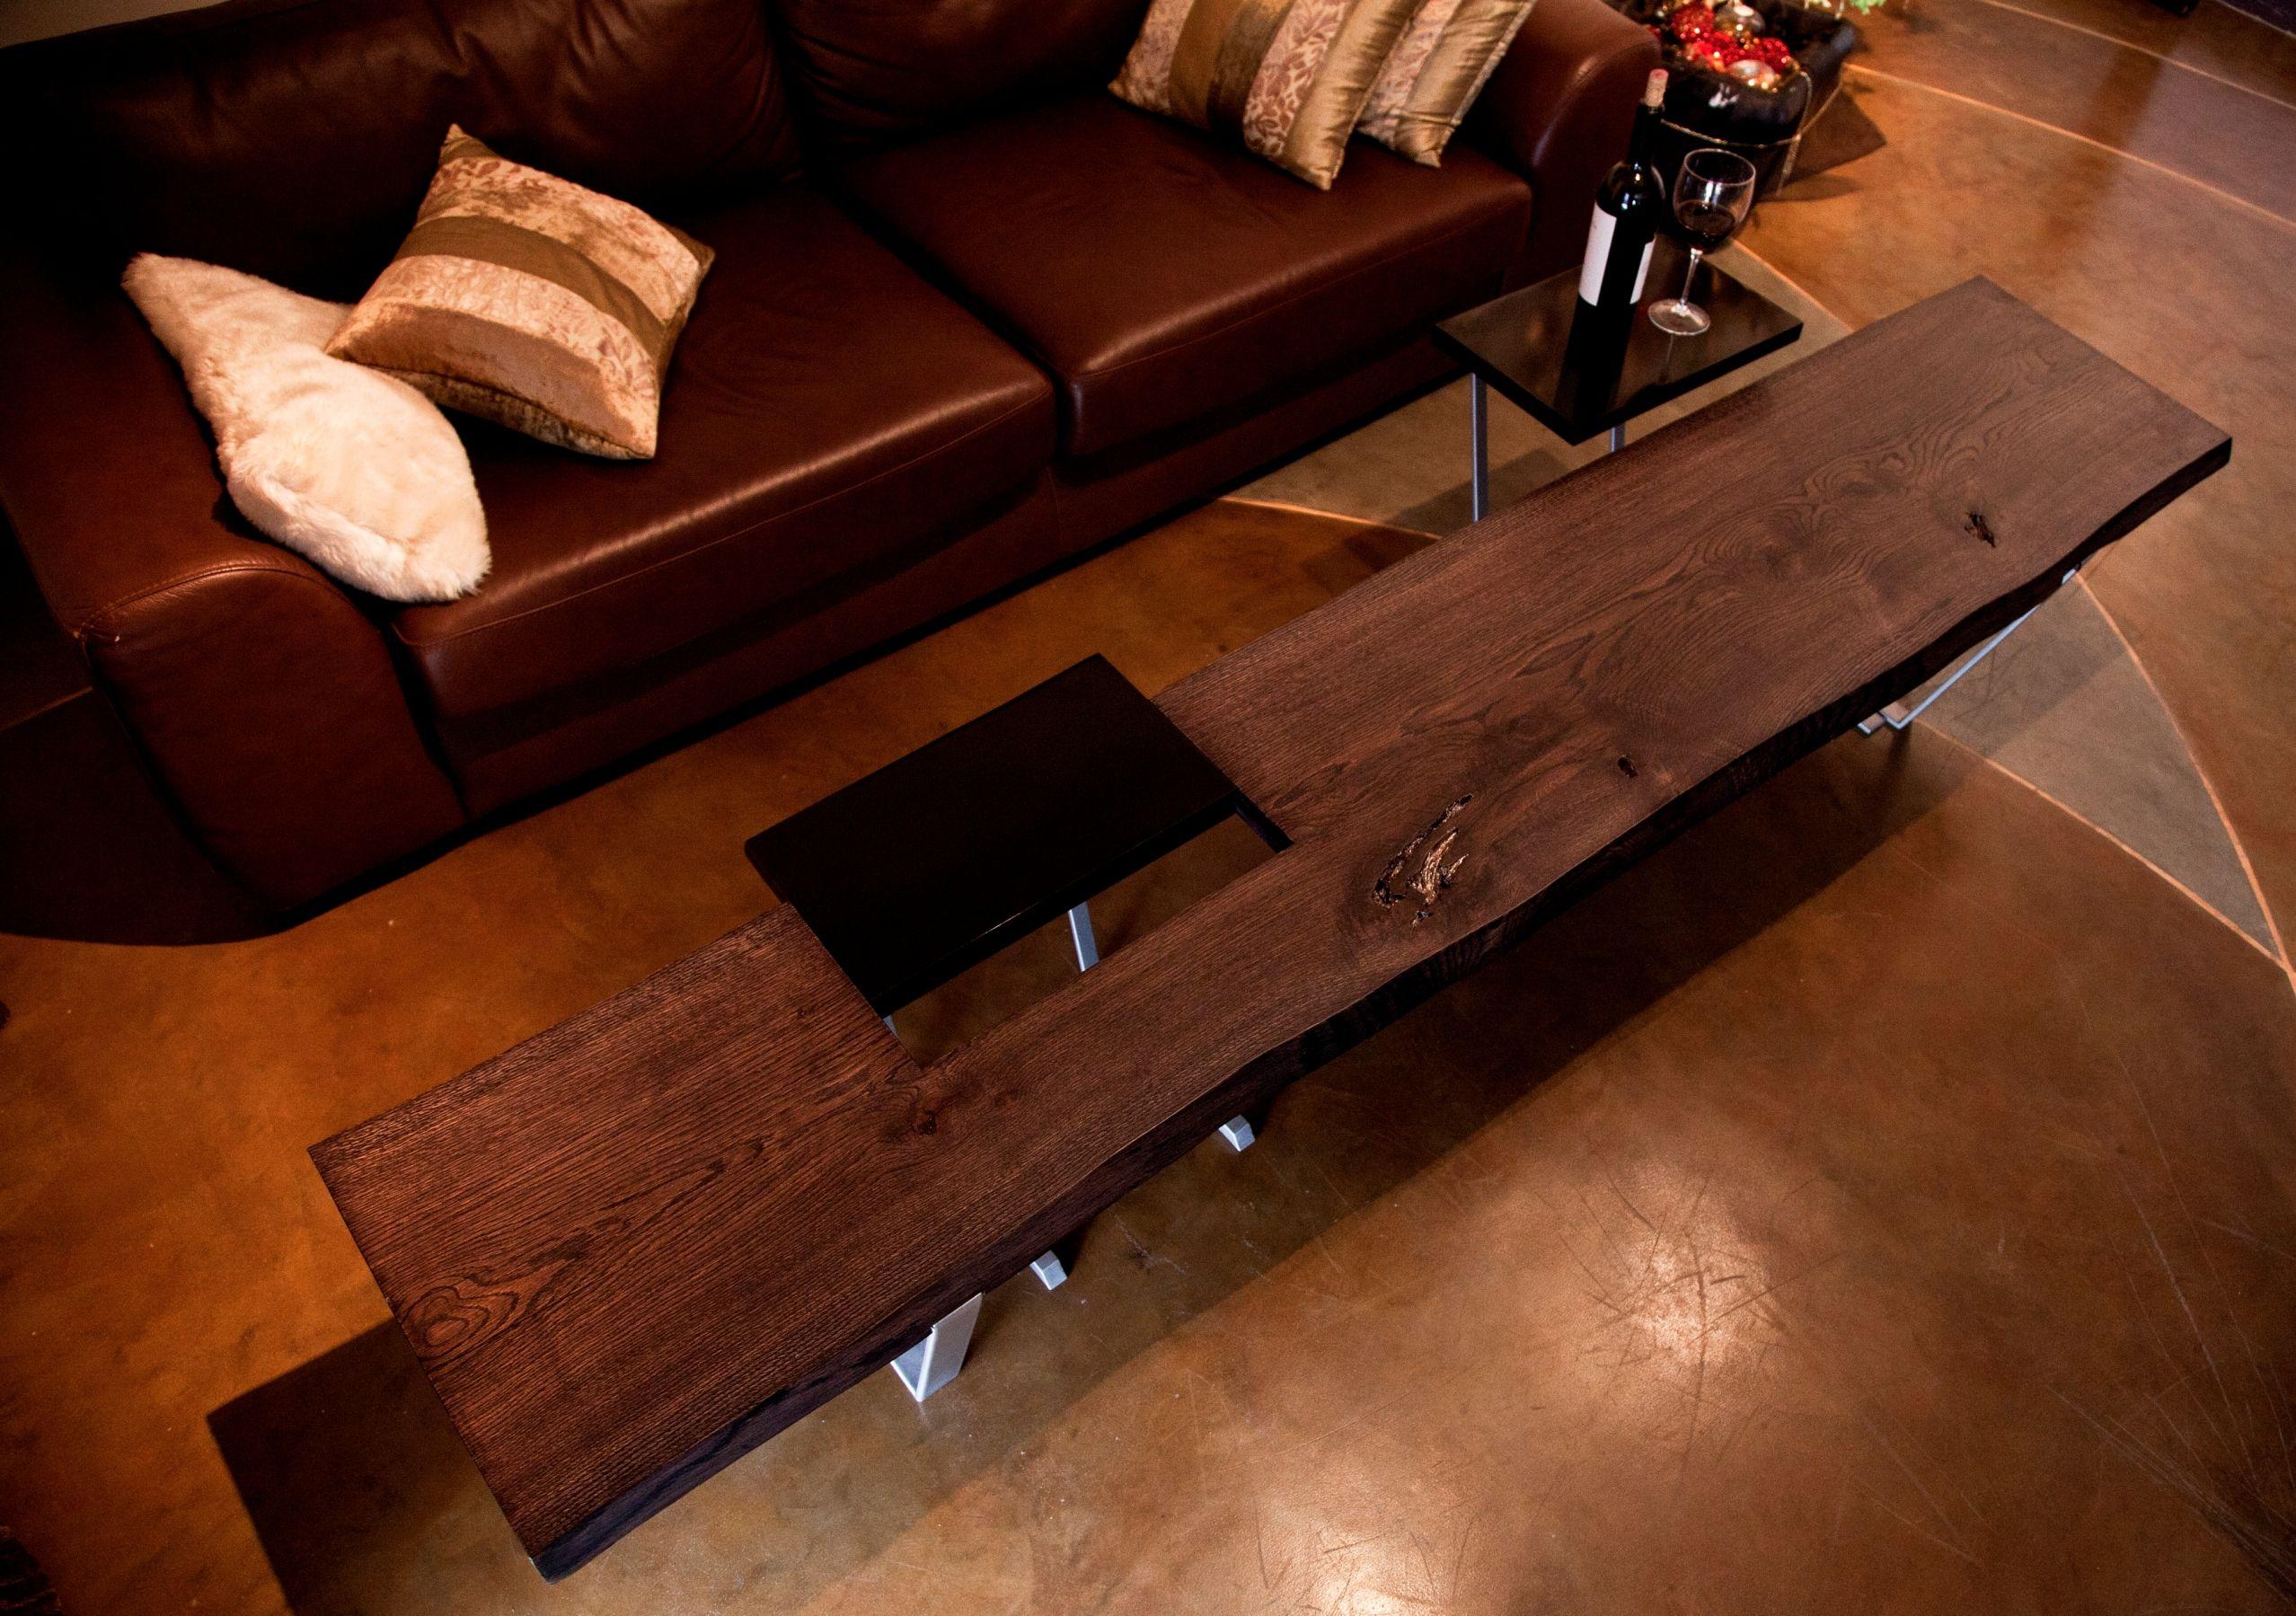 Yugoslavian Solid Oak Wood Coffee Table Set Designed By Yazan Hijazin Coffee Table Wood Coffee Table Setting Interior Design Services [ 1799 x 2556 Pixel ]